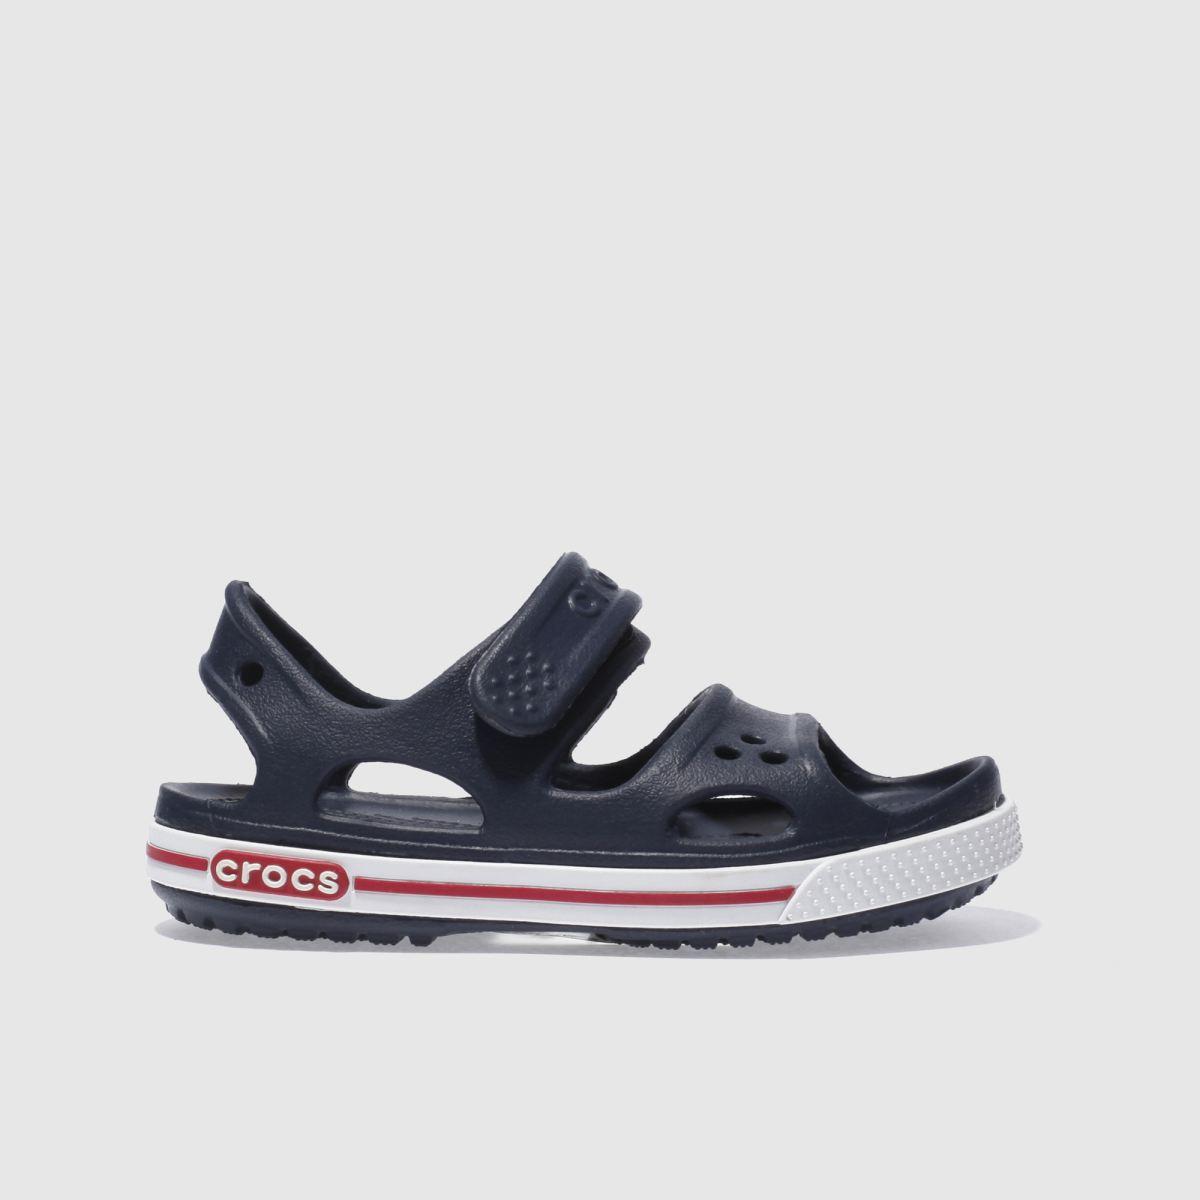 Crocs Crocs Navy & White Crocband Sandal Boys Junior Sandals